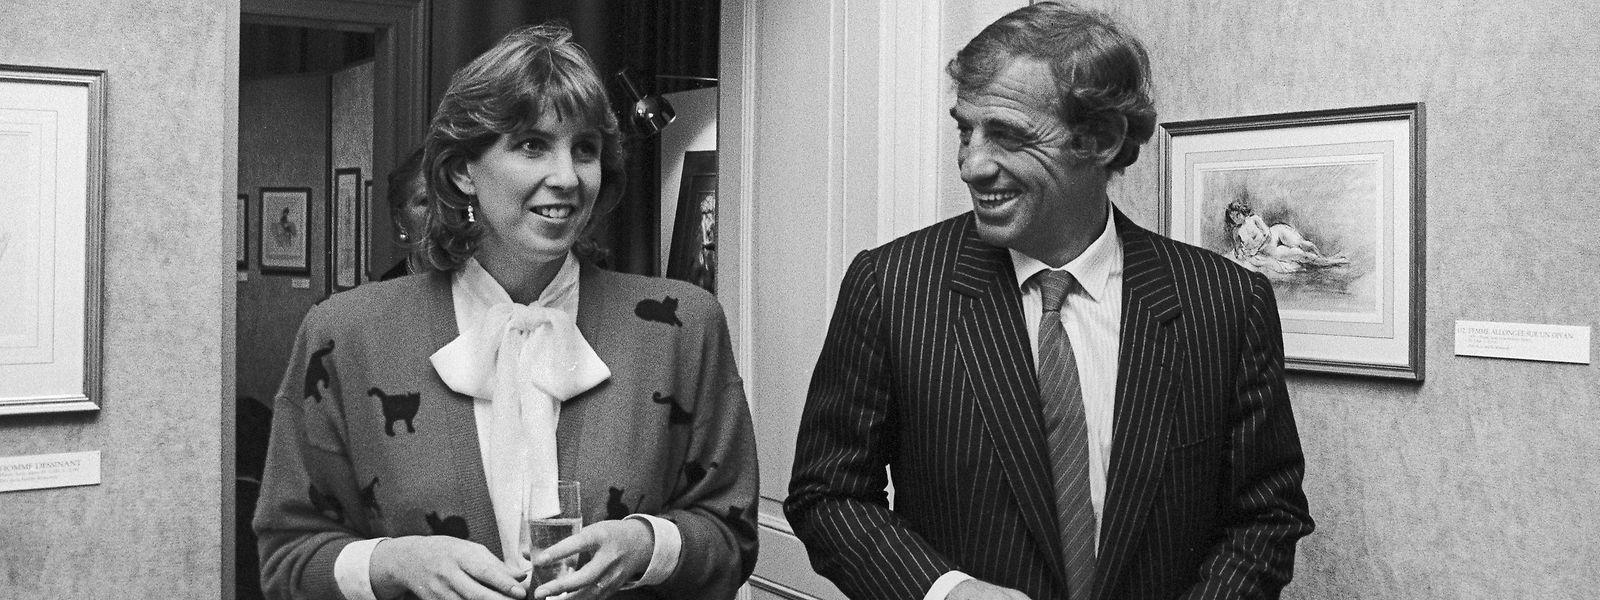 Lydie Polfer e Jean-Paul Belmondo